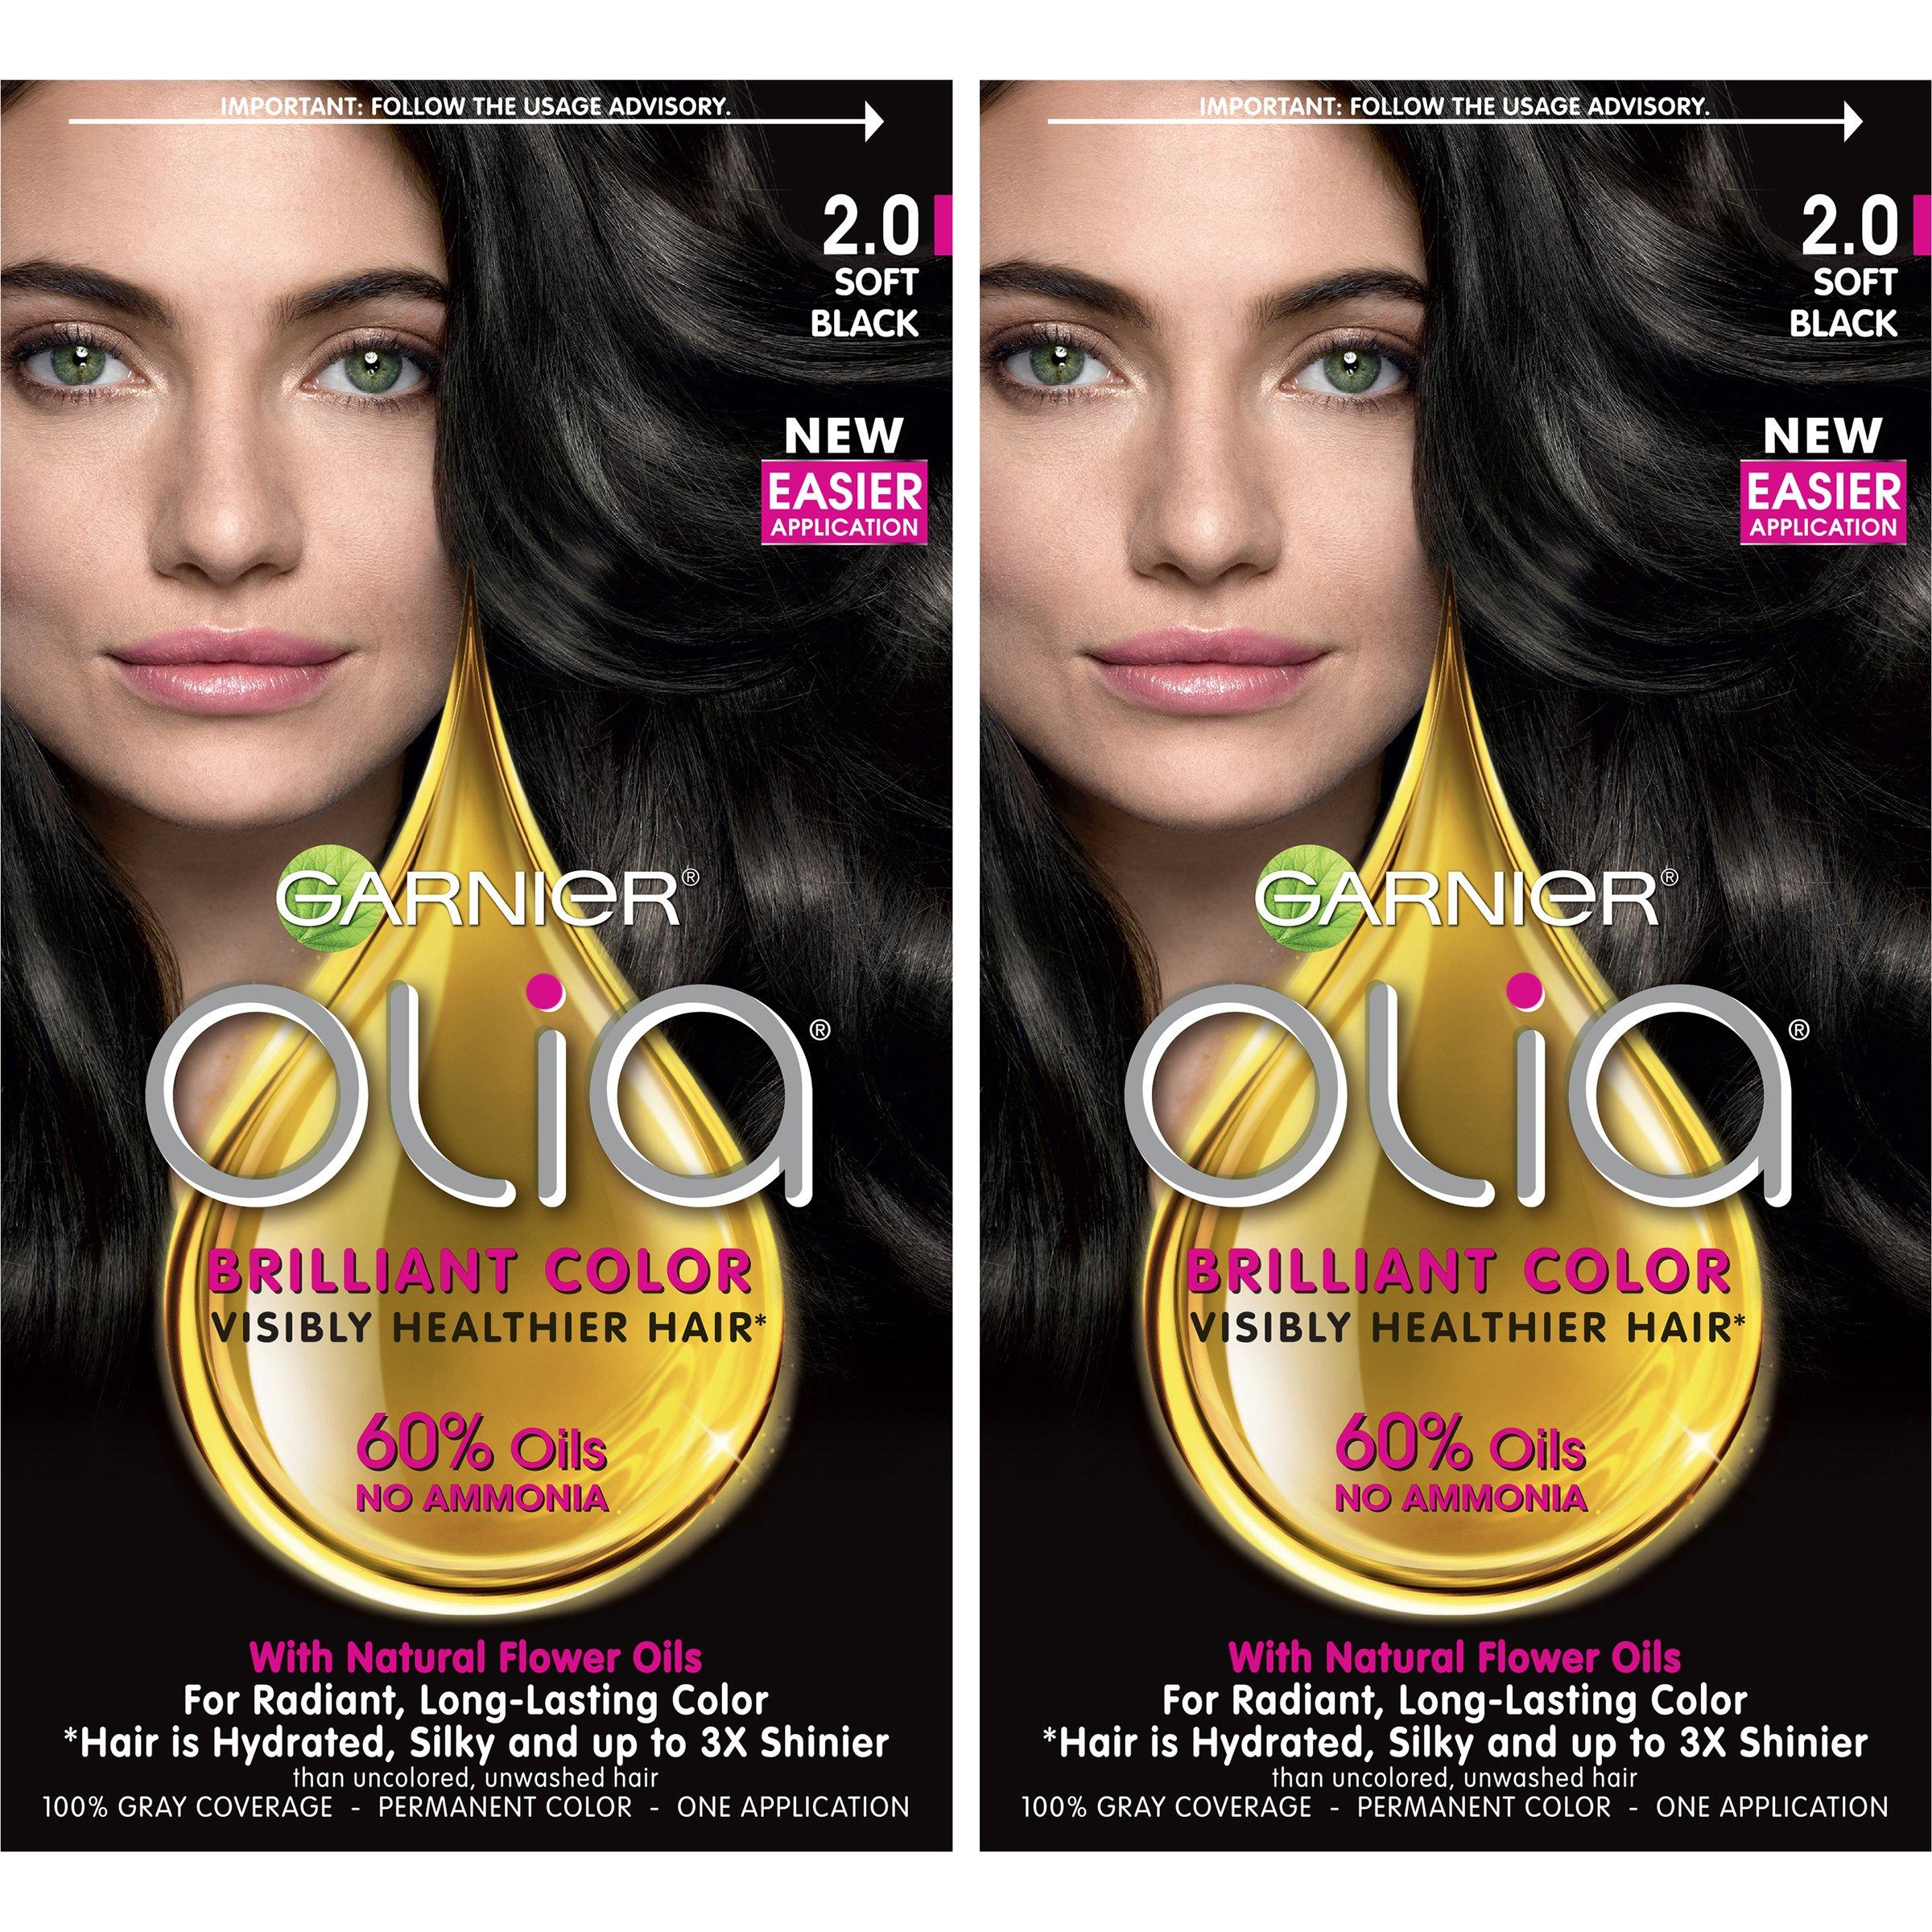 Garnier Hair Color Olia Oil Powered Permanent, 2.0 Soft Black, 2 Count